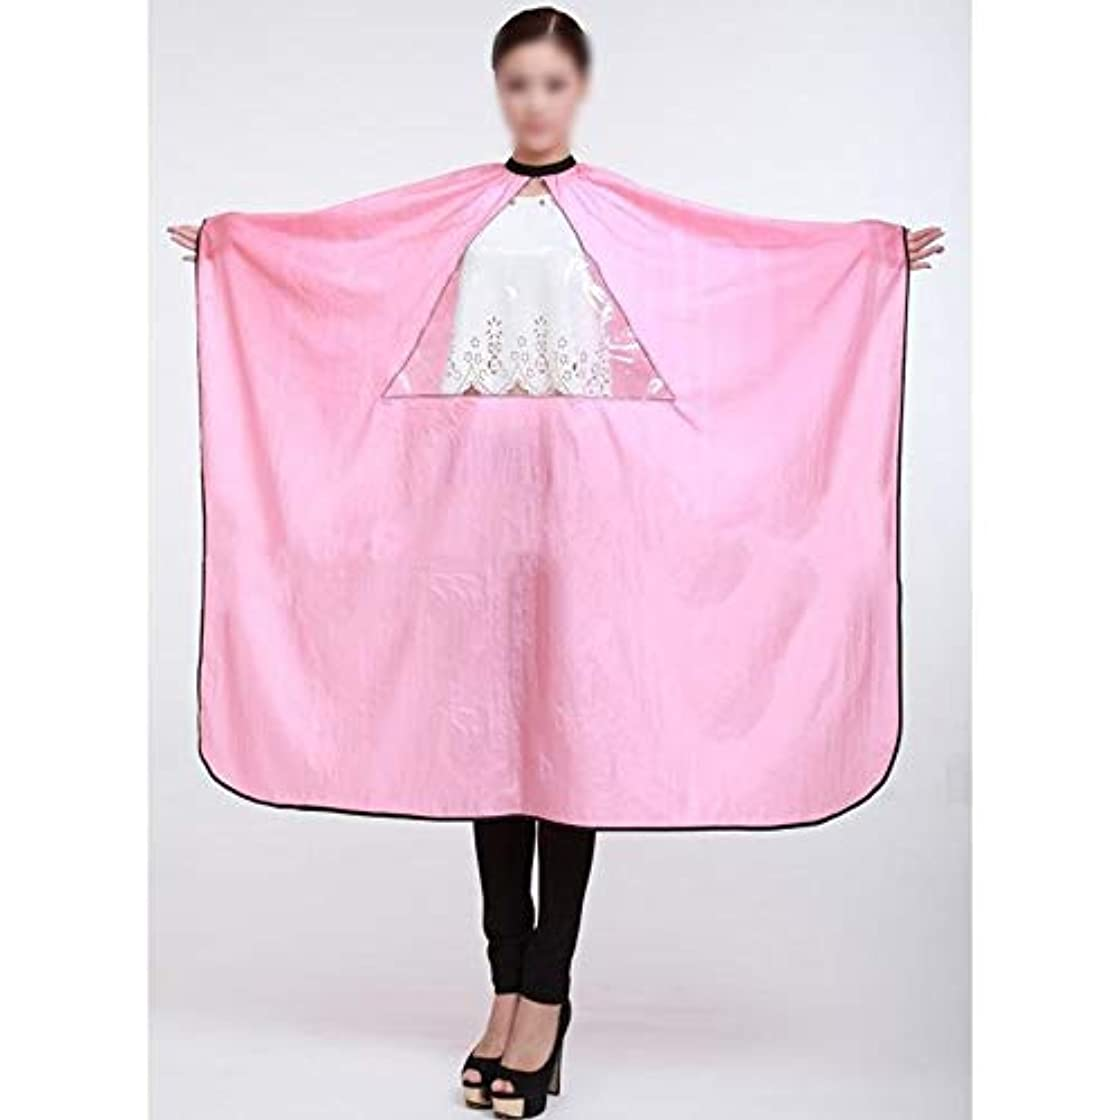 Lucy Day 理髪店の防水毛の切断の岬のための美容院のエプロンの毛布 (色 : ピンク)